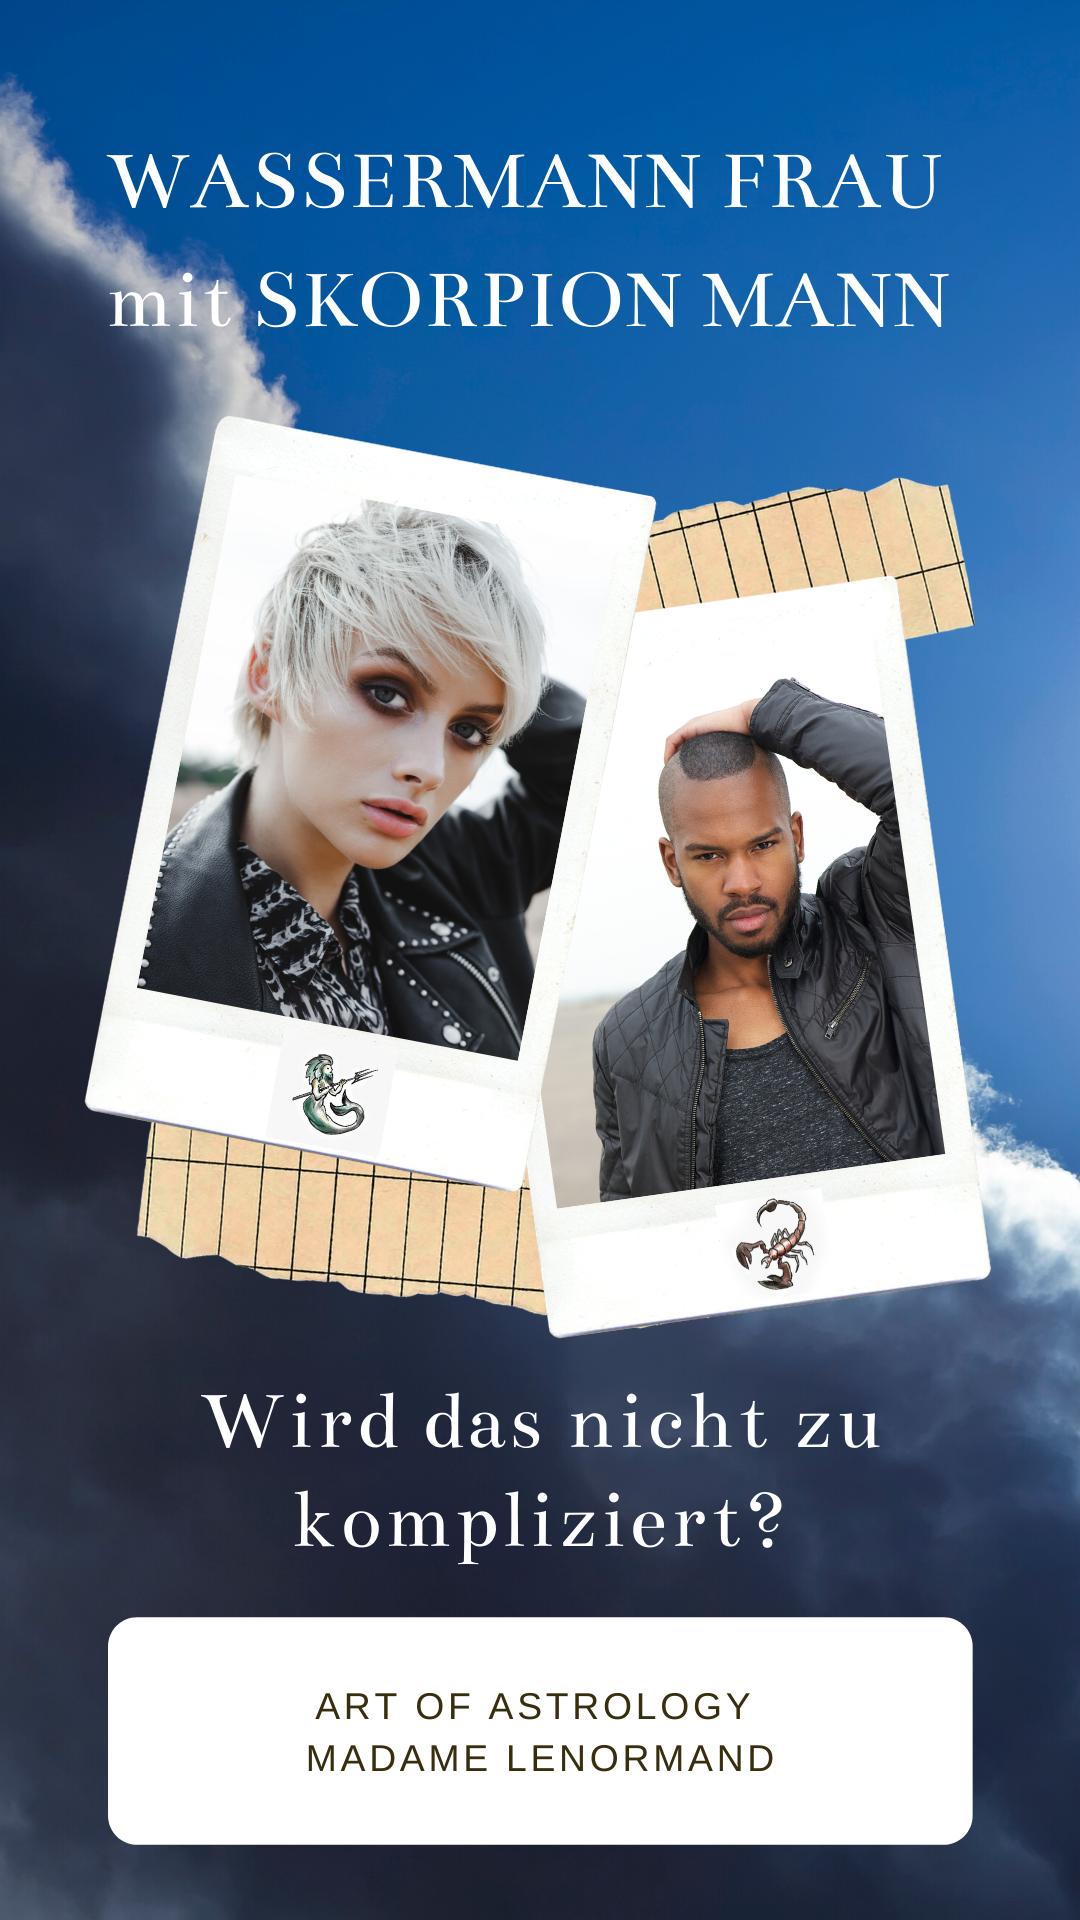 Skorpion Mann & Wassermann Frau - Liebe?   Skorpion mann